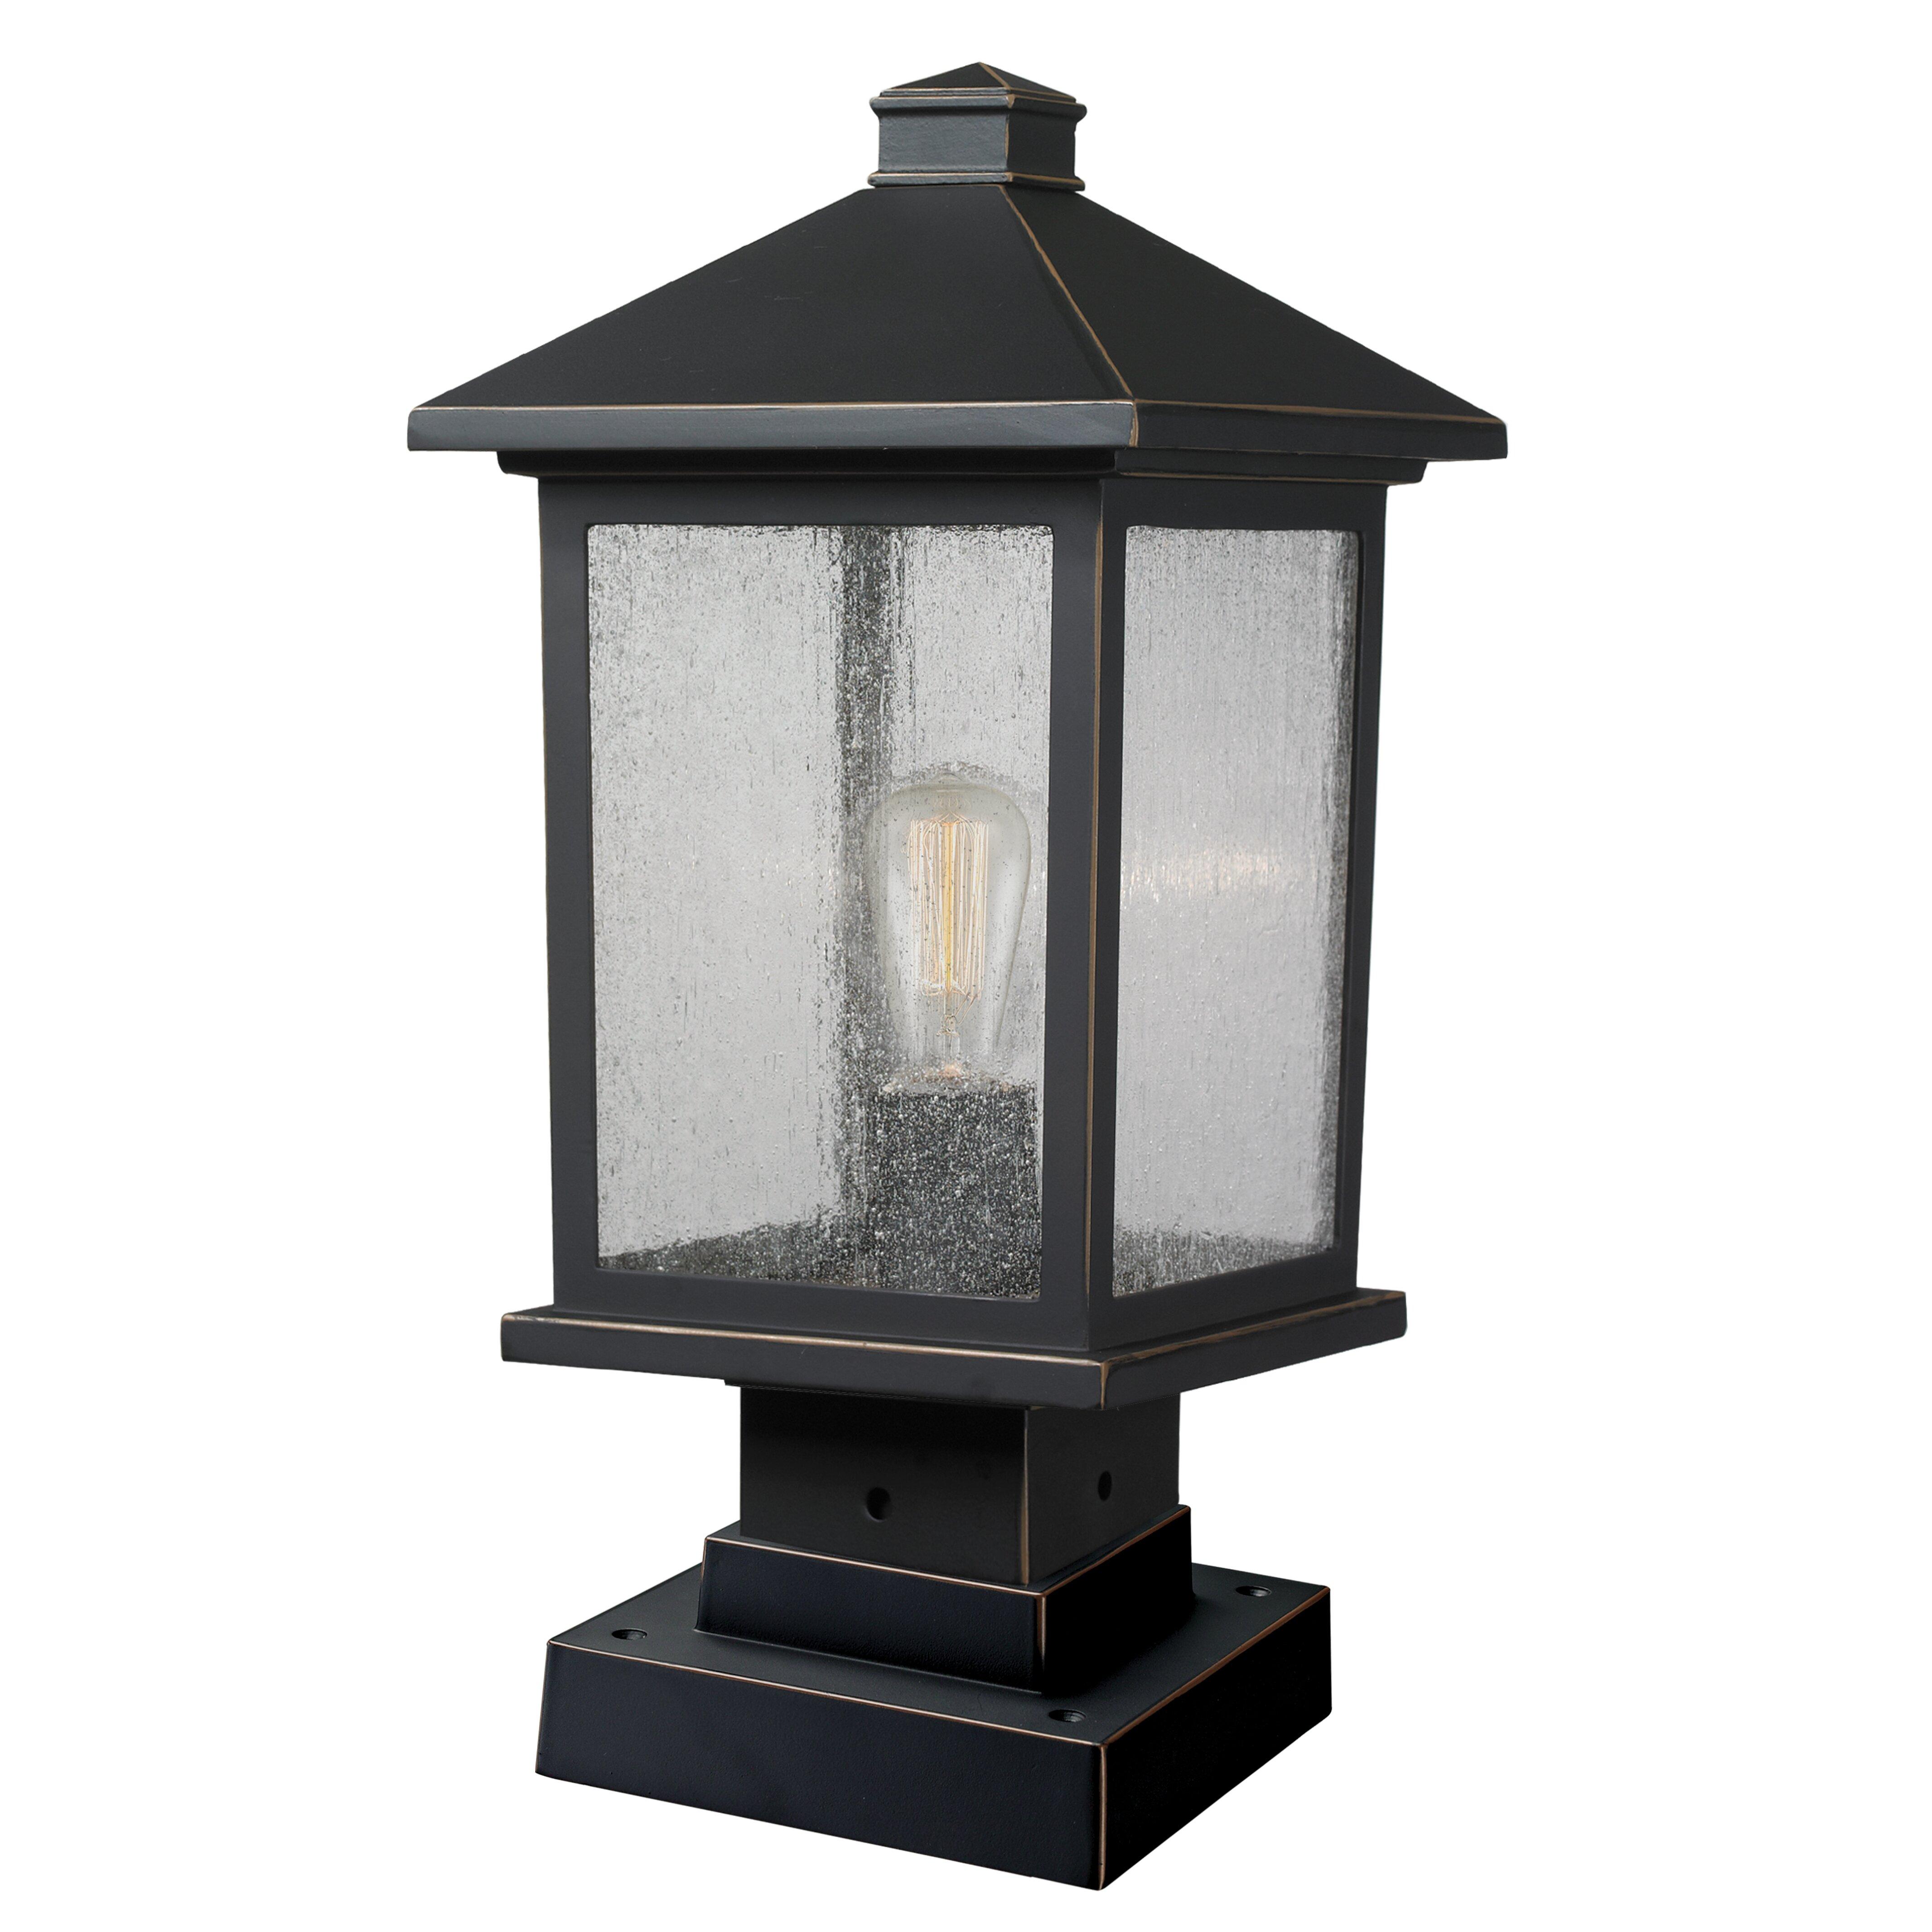 portland 1 light outdoor pier mount light wayfair. Black Bedroom Furniture Sets. Home Design Ideas